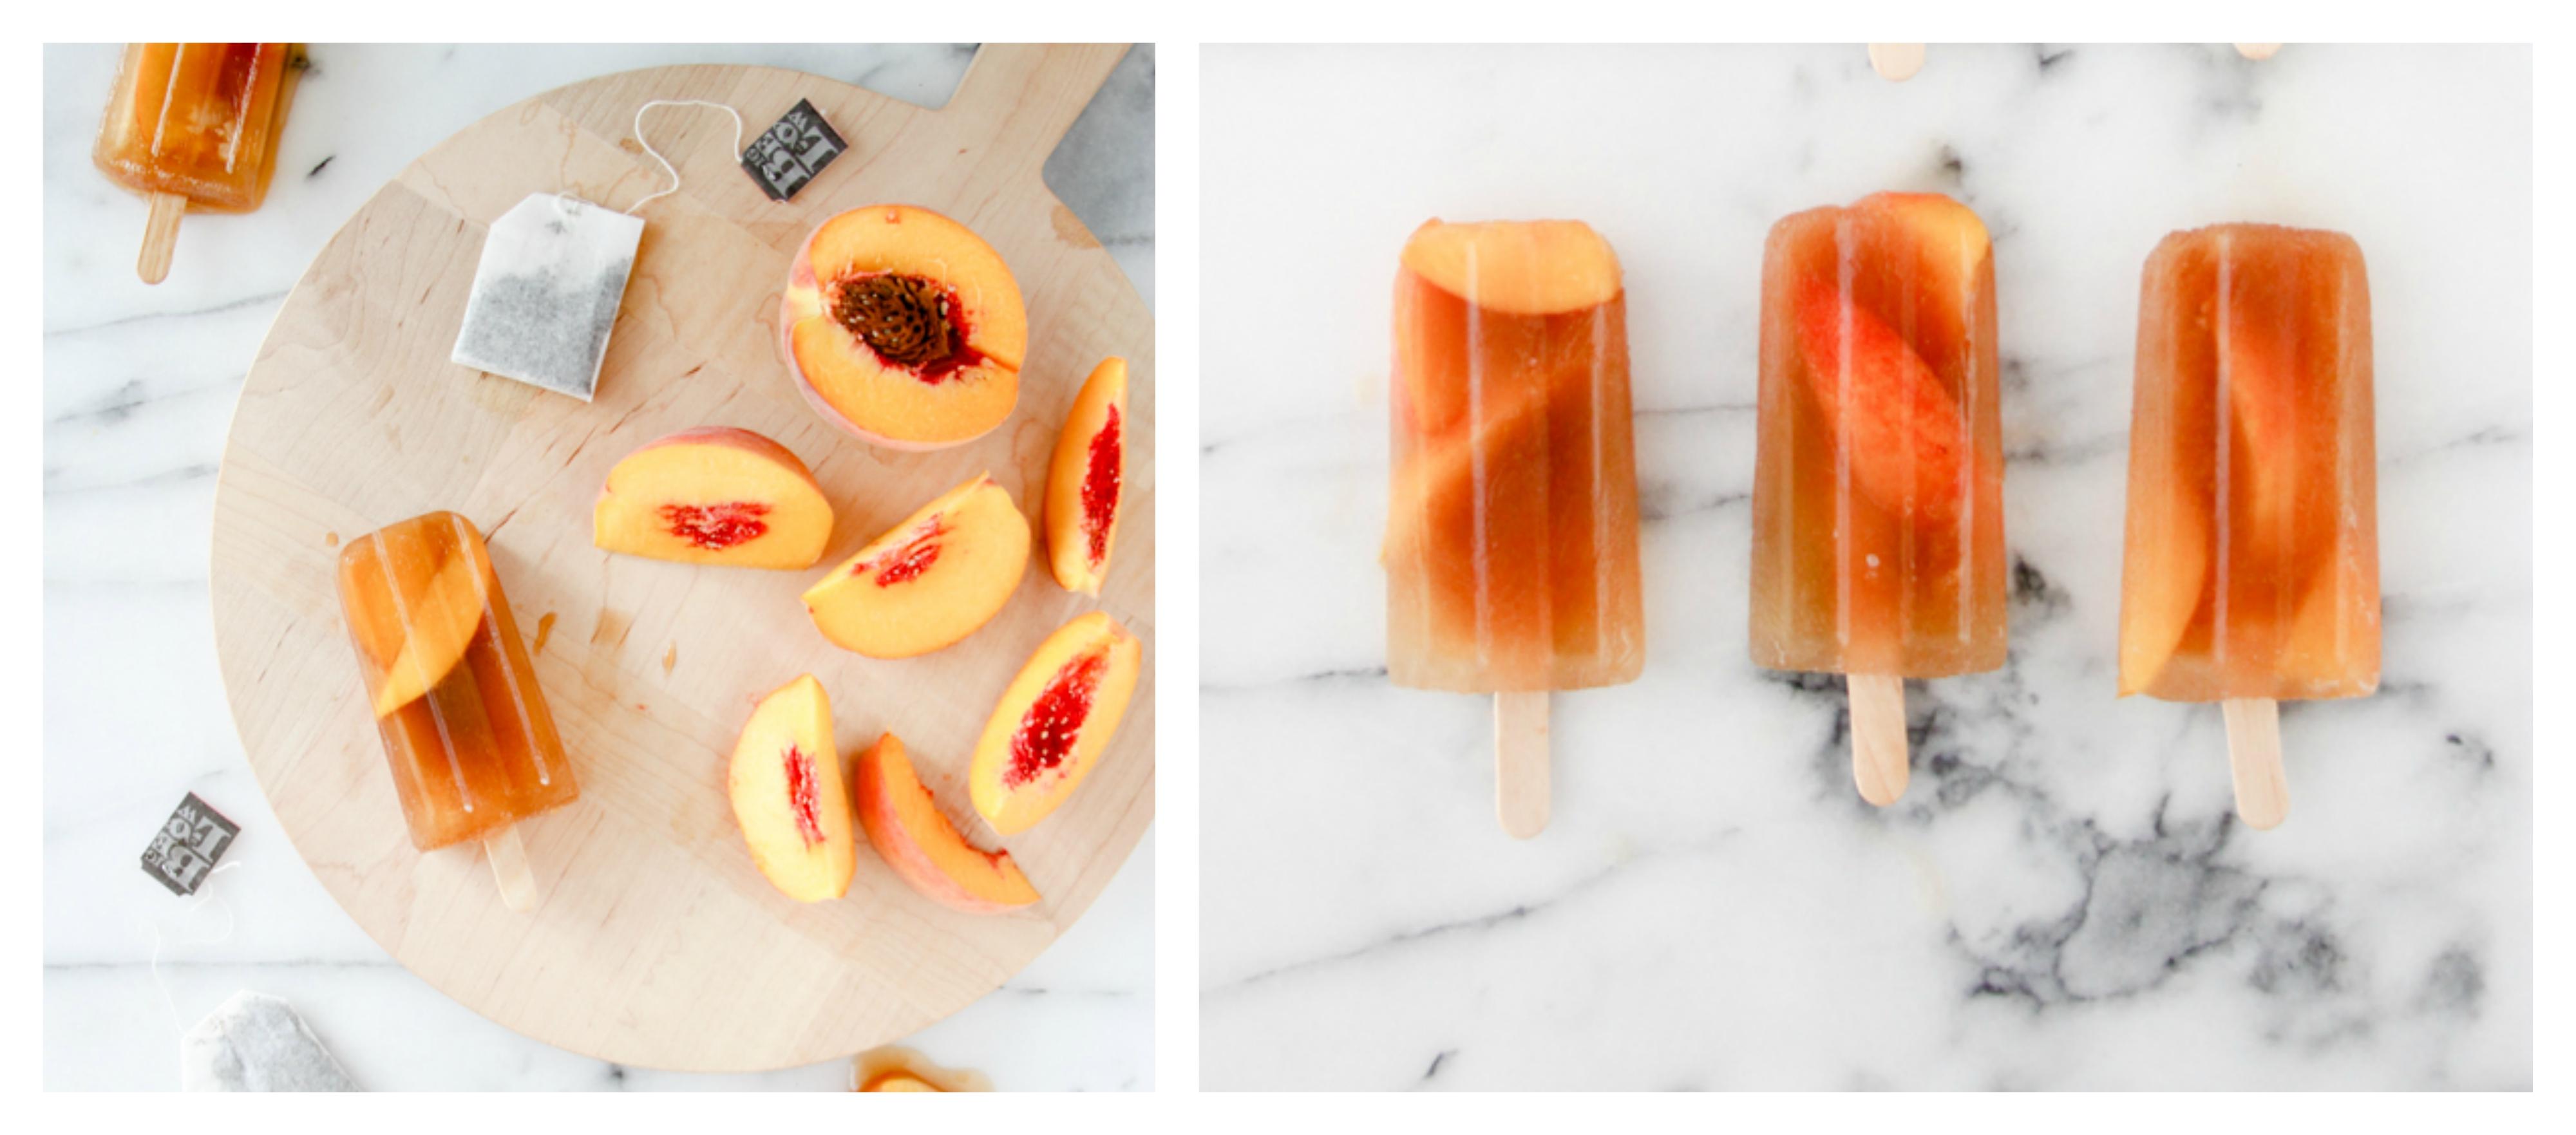 vir: http://www.papernstitchblog.com/2014/07/28/make-this-peach-ice-tea-popsicles-recipe/